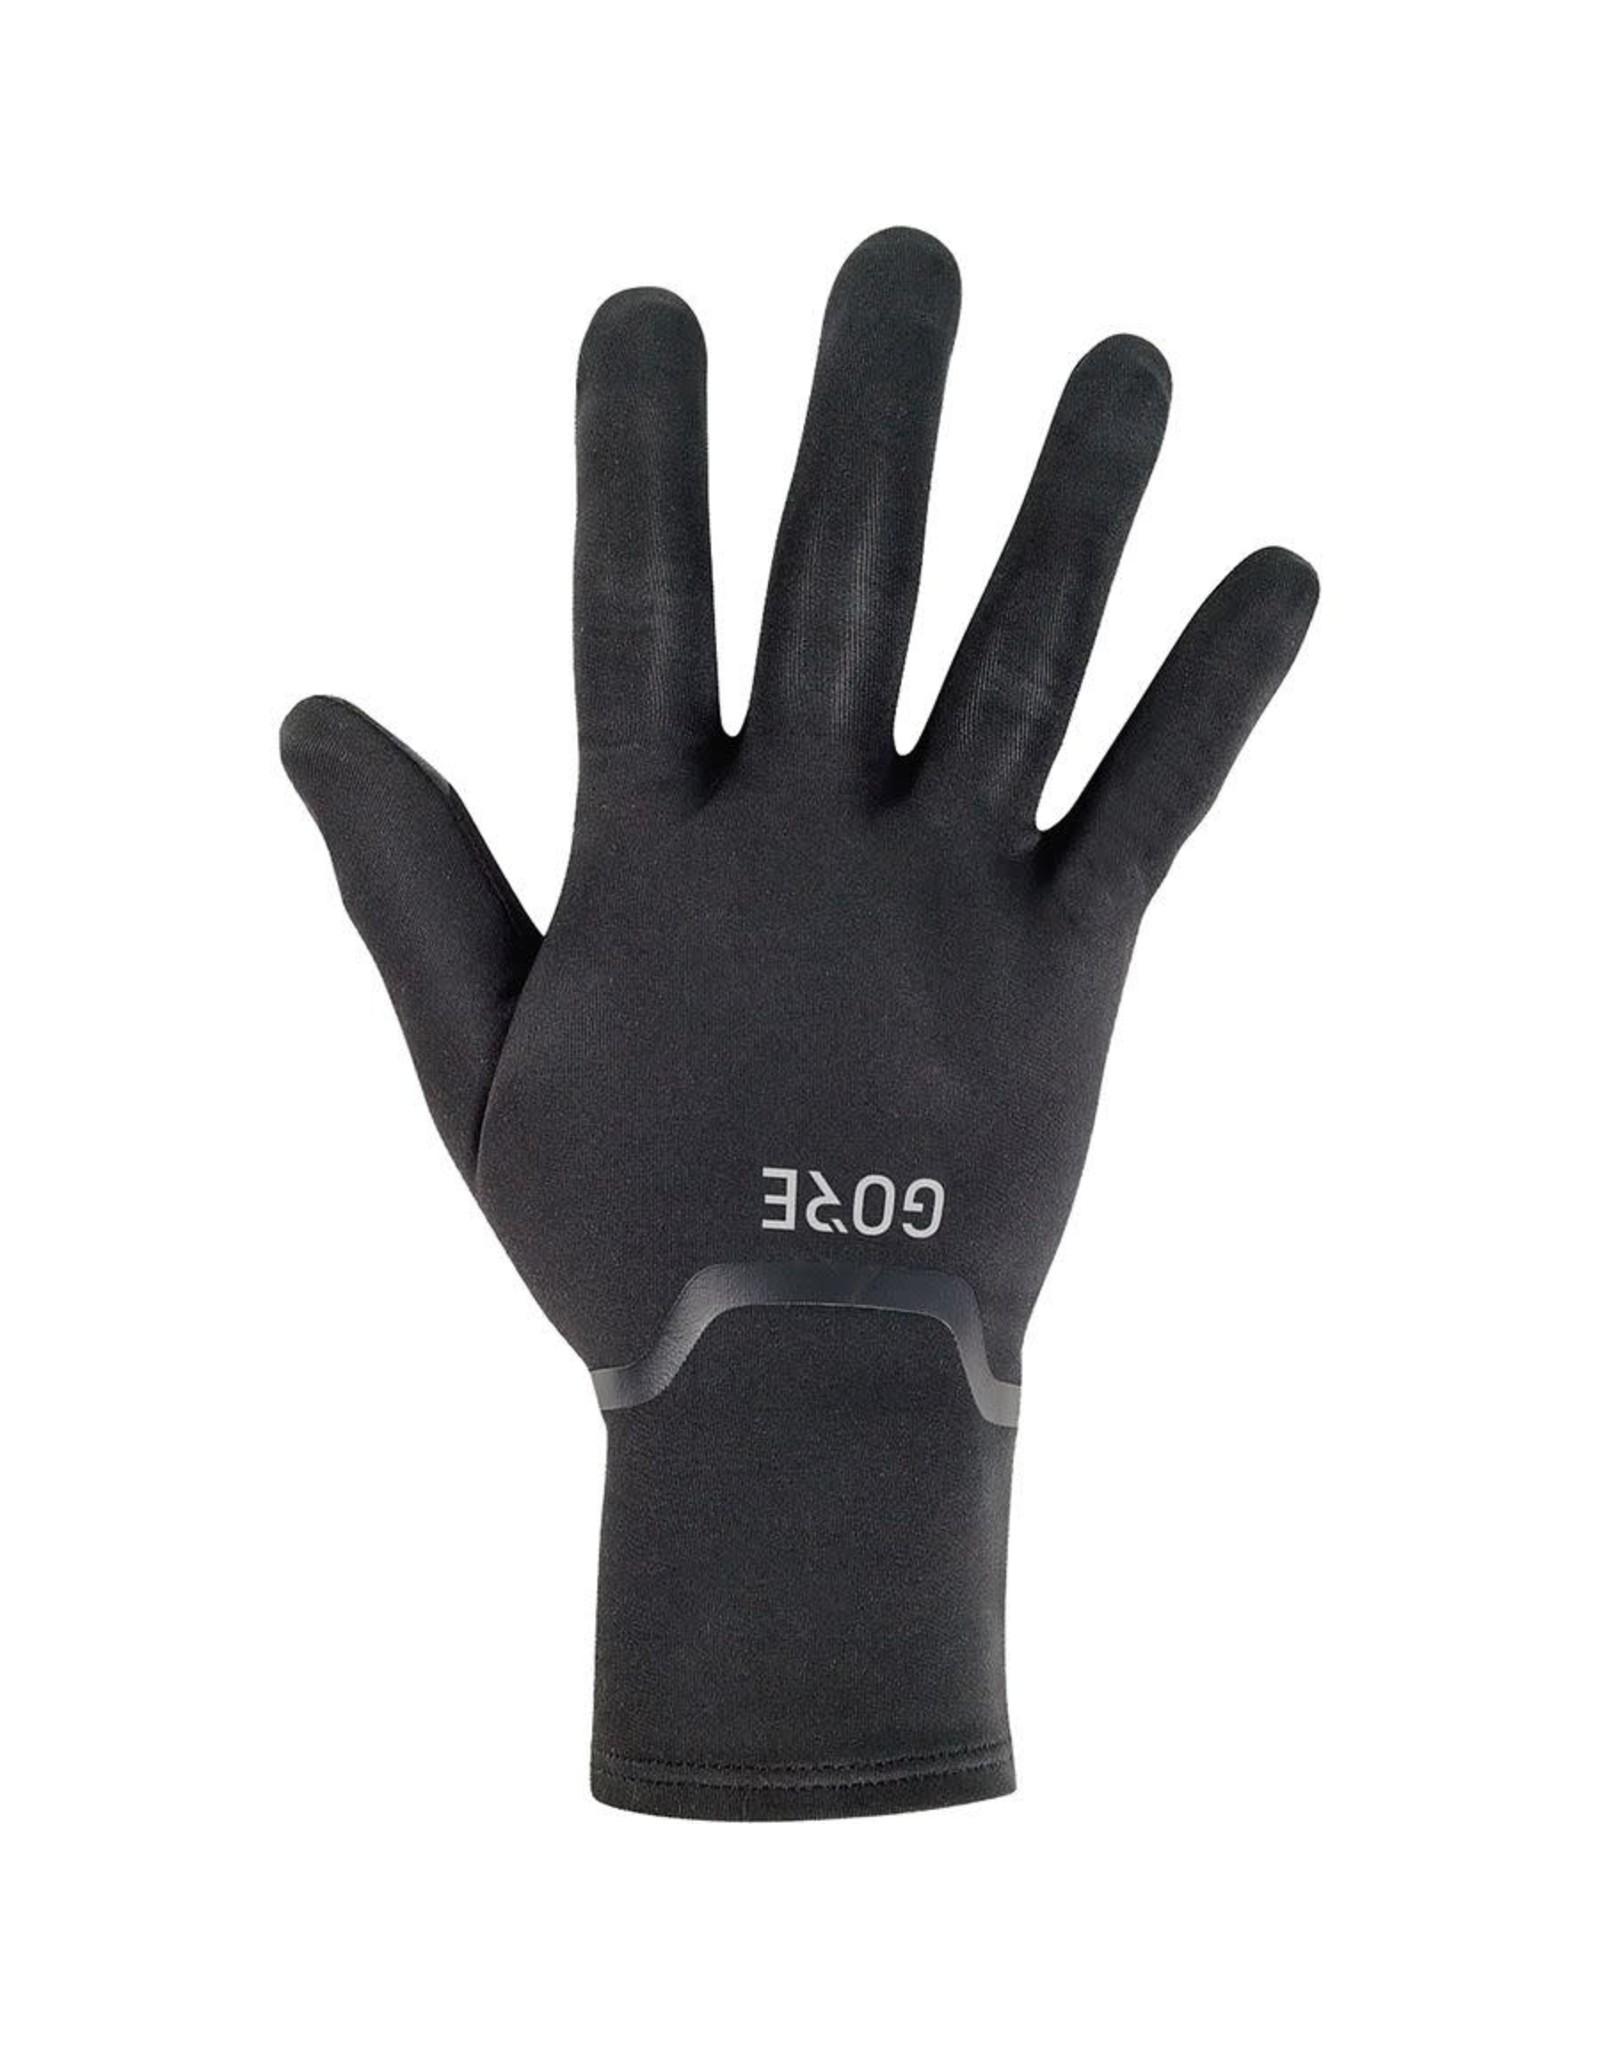 Gore Gore-Tex Infinium Insulated Glove